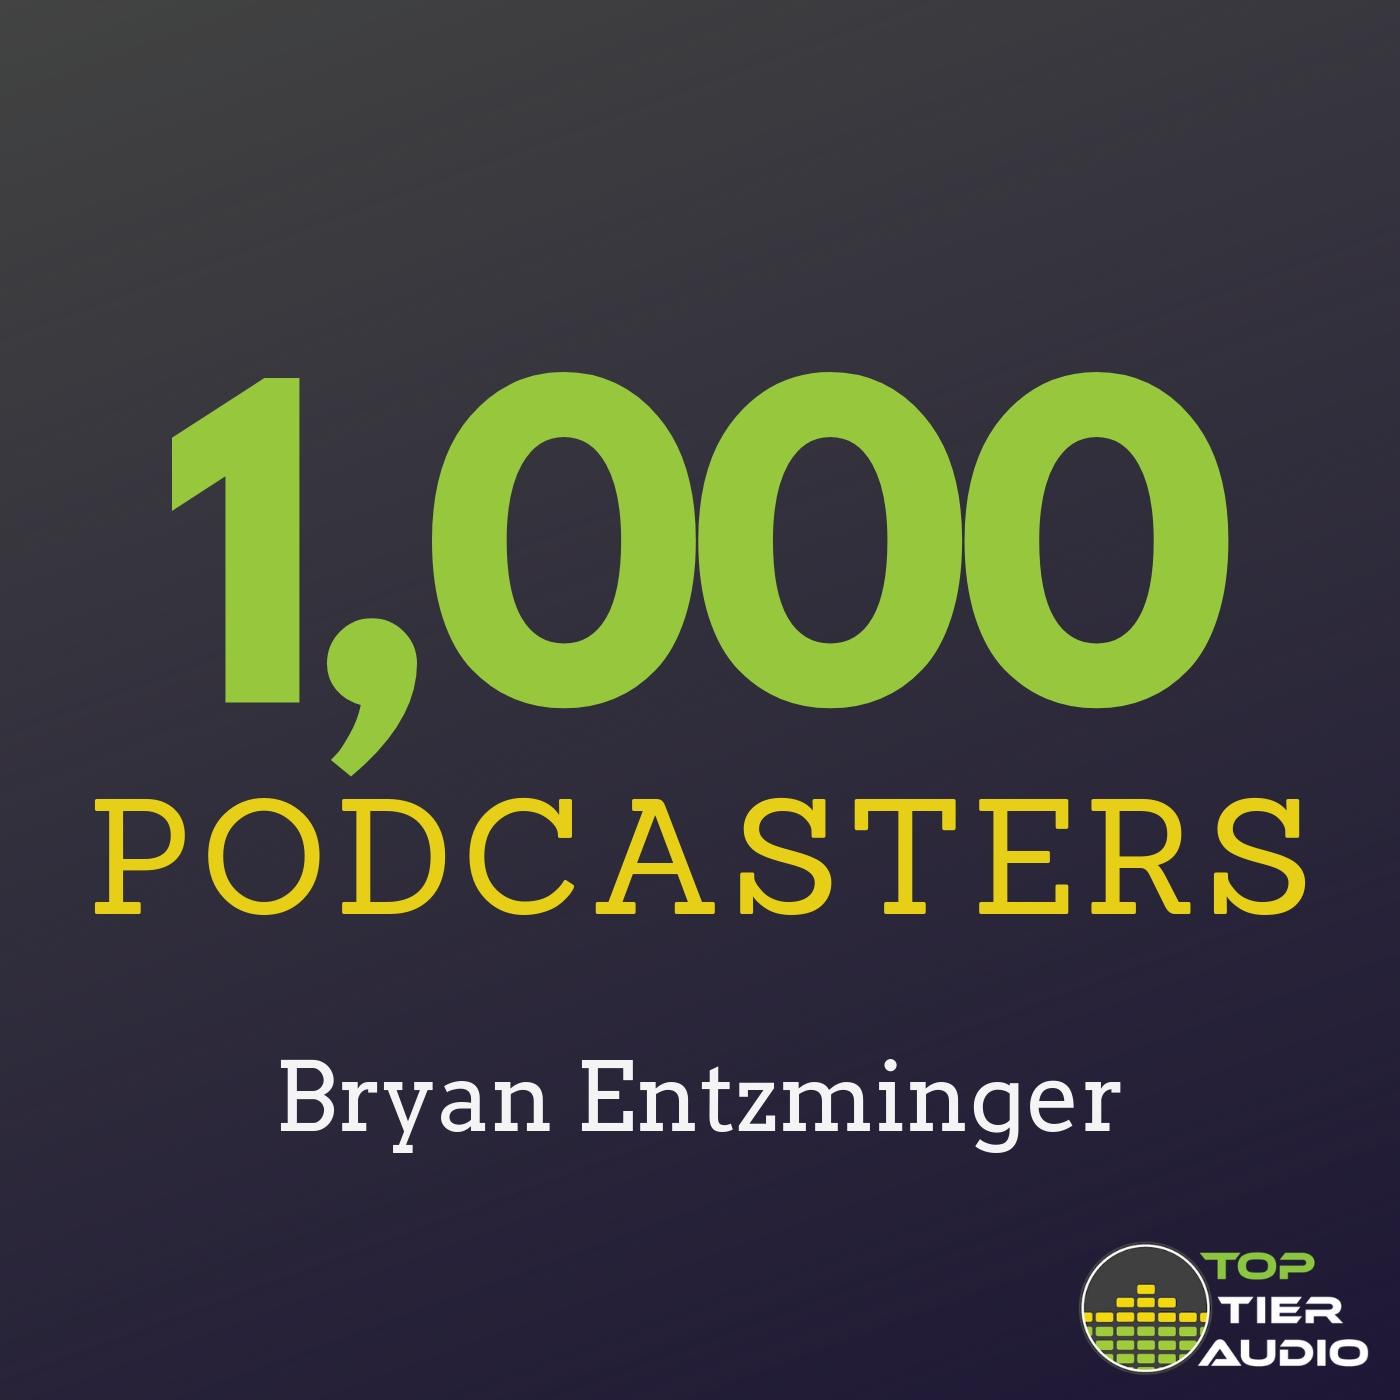 Artwork for podcast 1000 Podcasters